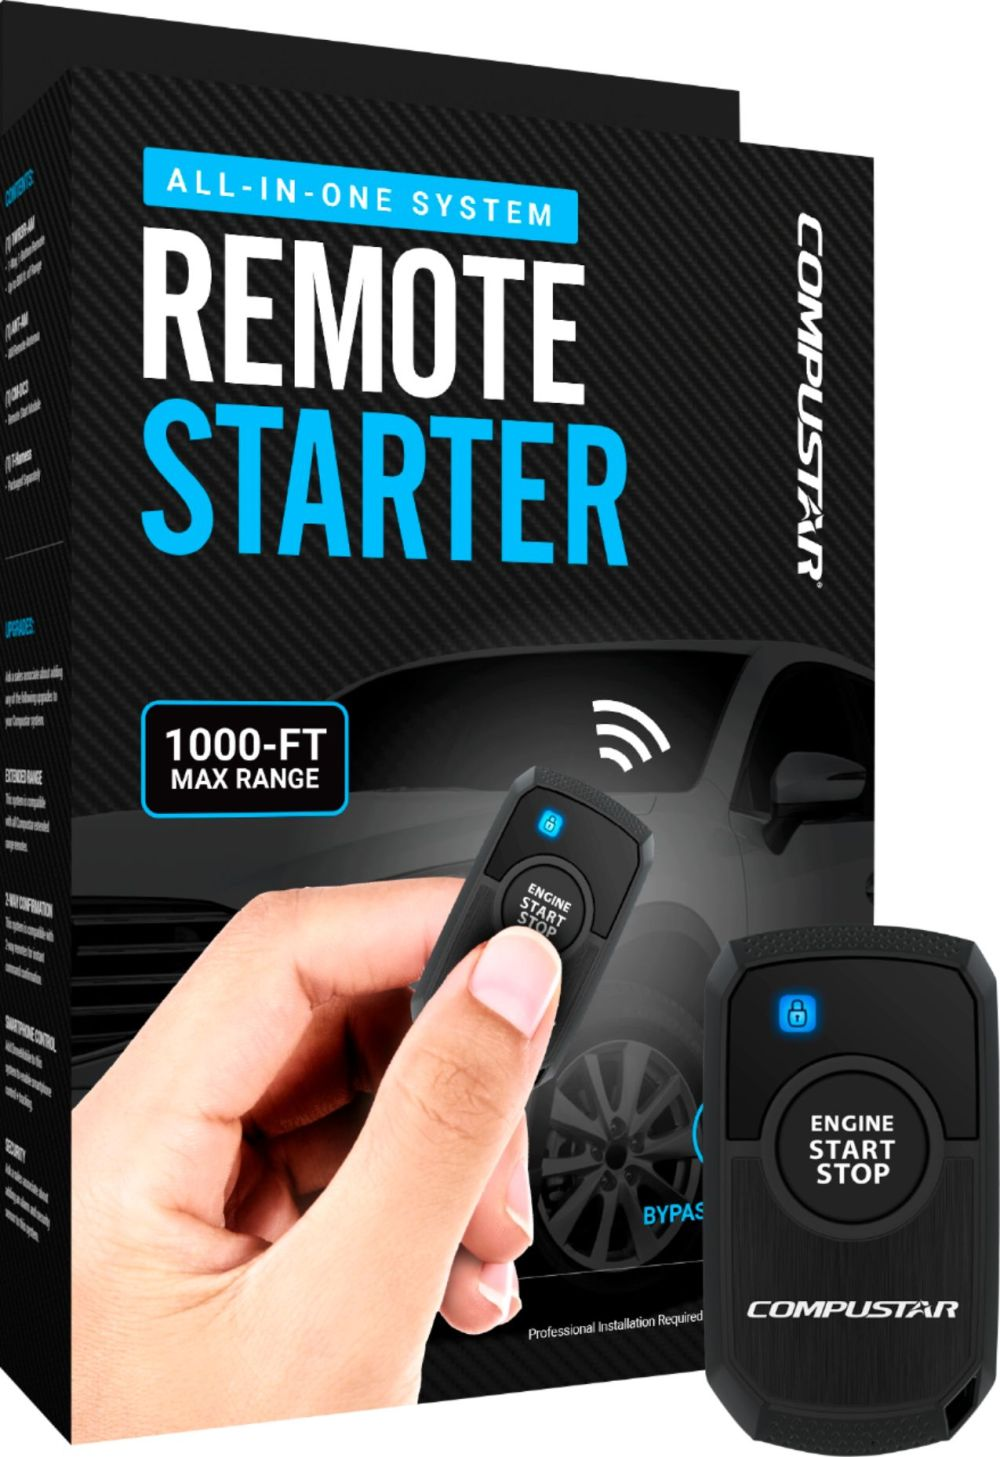 medium resolution of compustar 1 button remote starter t harness kit 2nd gen installation required black rs1b dc3 best buy